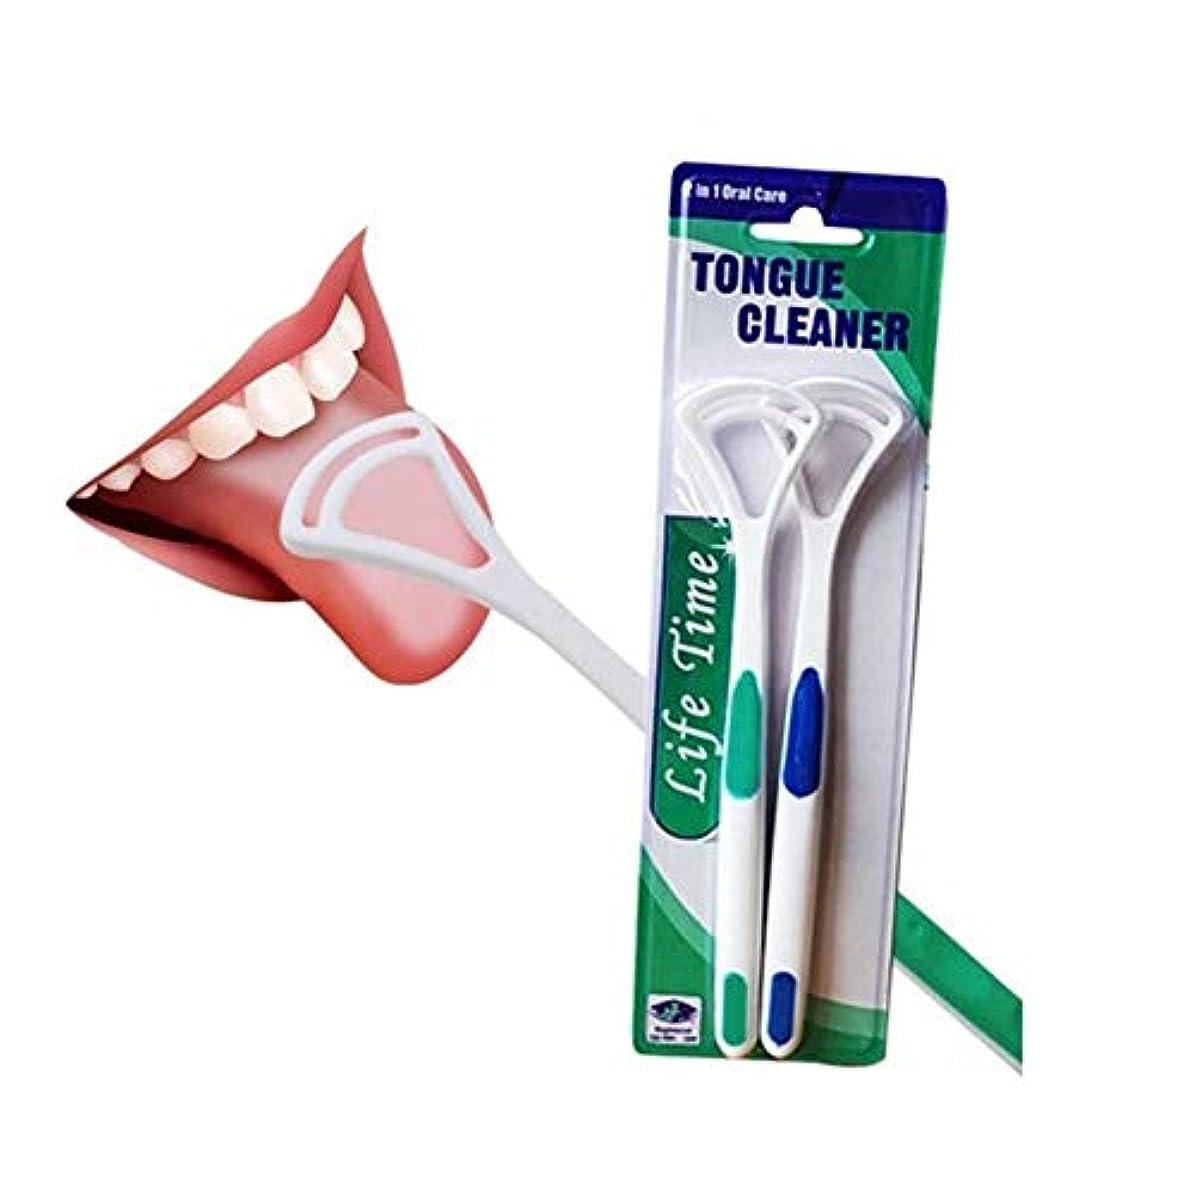 ZHQI-HEAL 4ピース新しいホット舌クリーナースクレーパースクラッチ舌コーティングブラシクリーナーシリカハンドル口腔衛生家族歯ケアツール (色 : Blue/green)